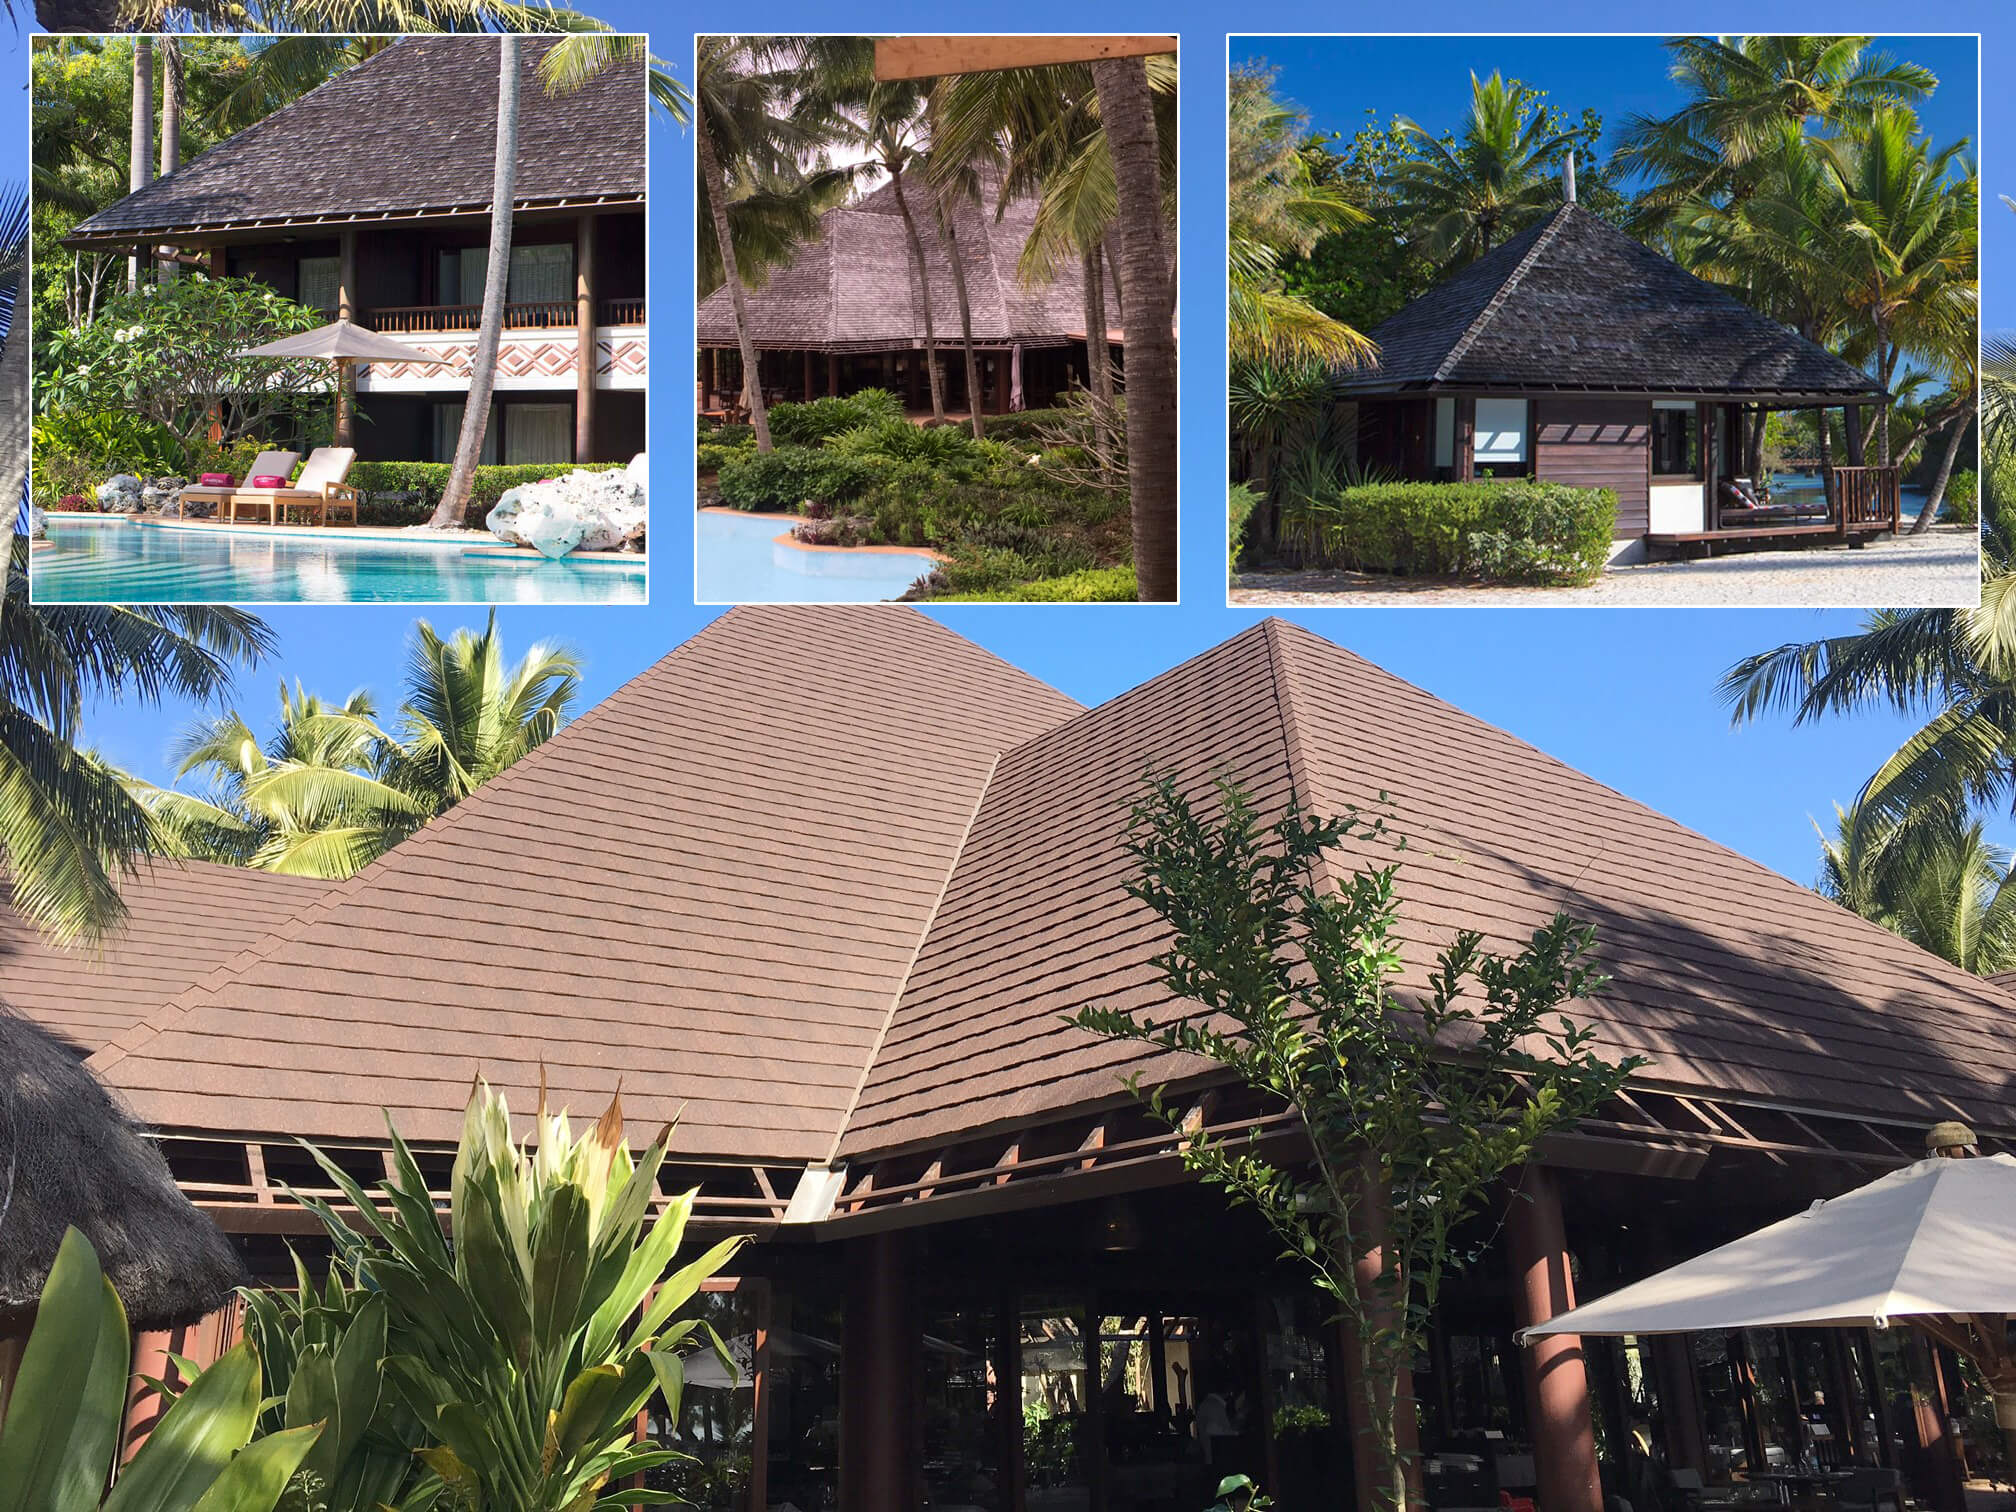 re-roofing-in-paradise-4.jpg